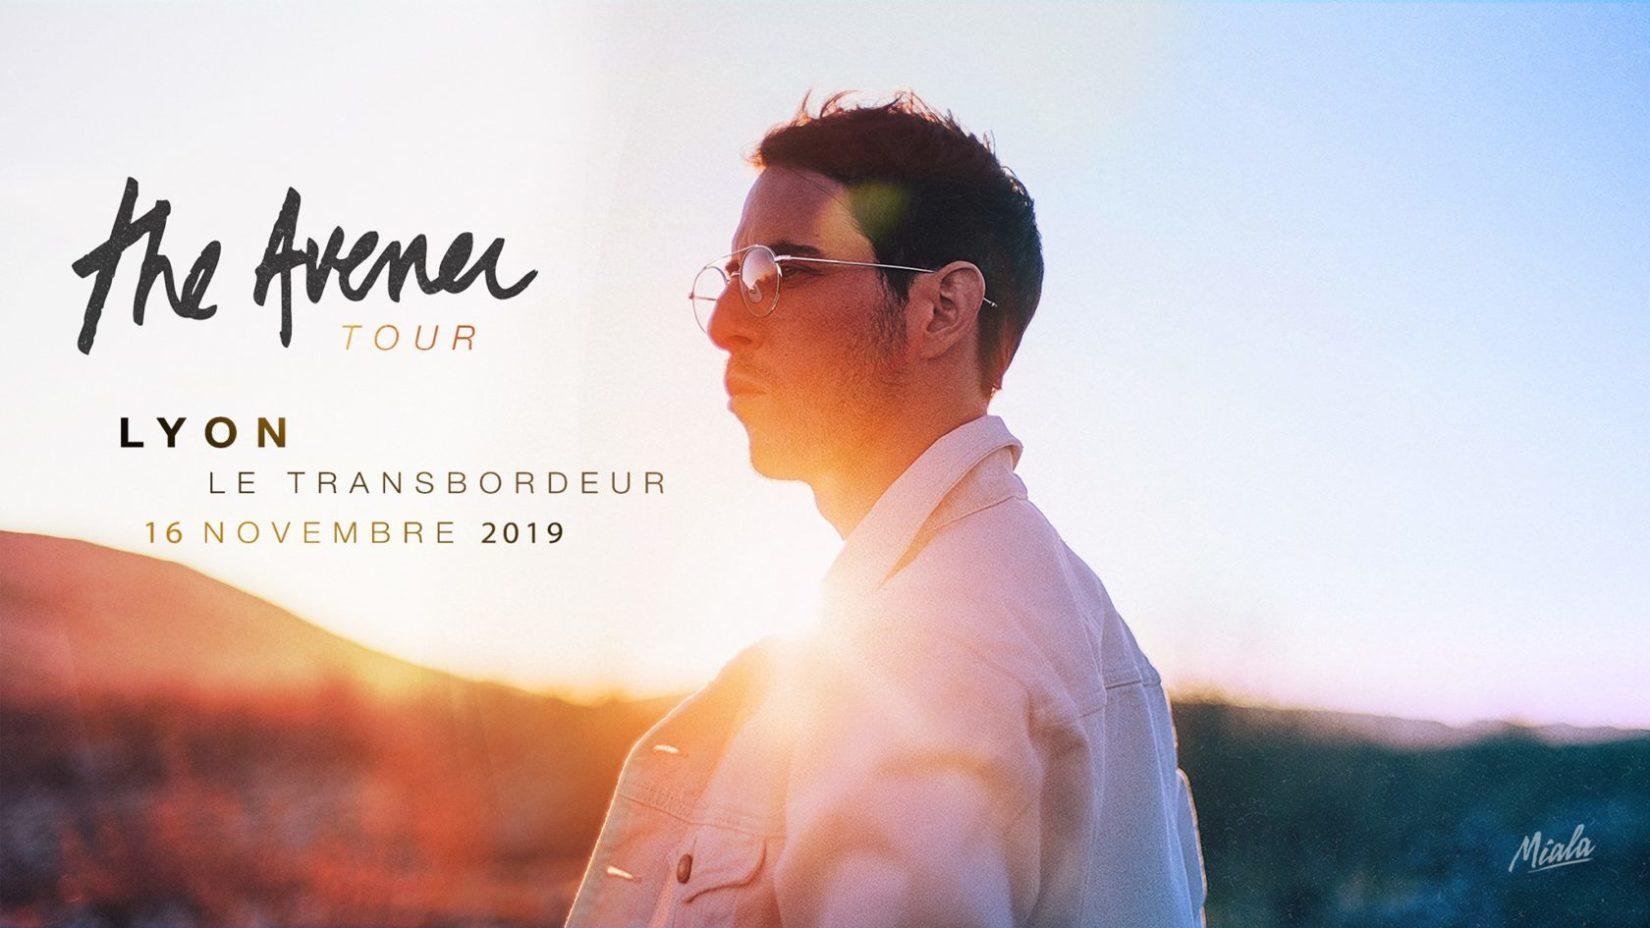 The Avener Tour - Le Transbordeur